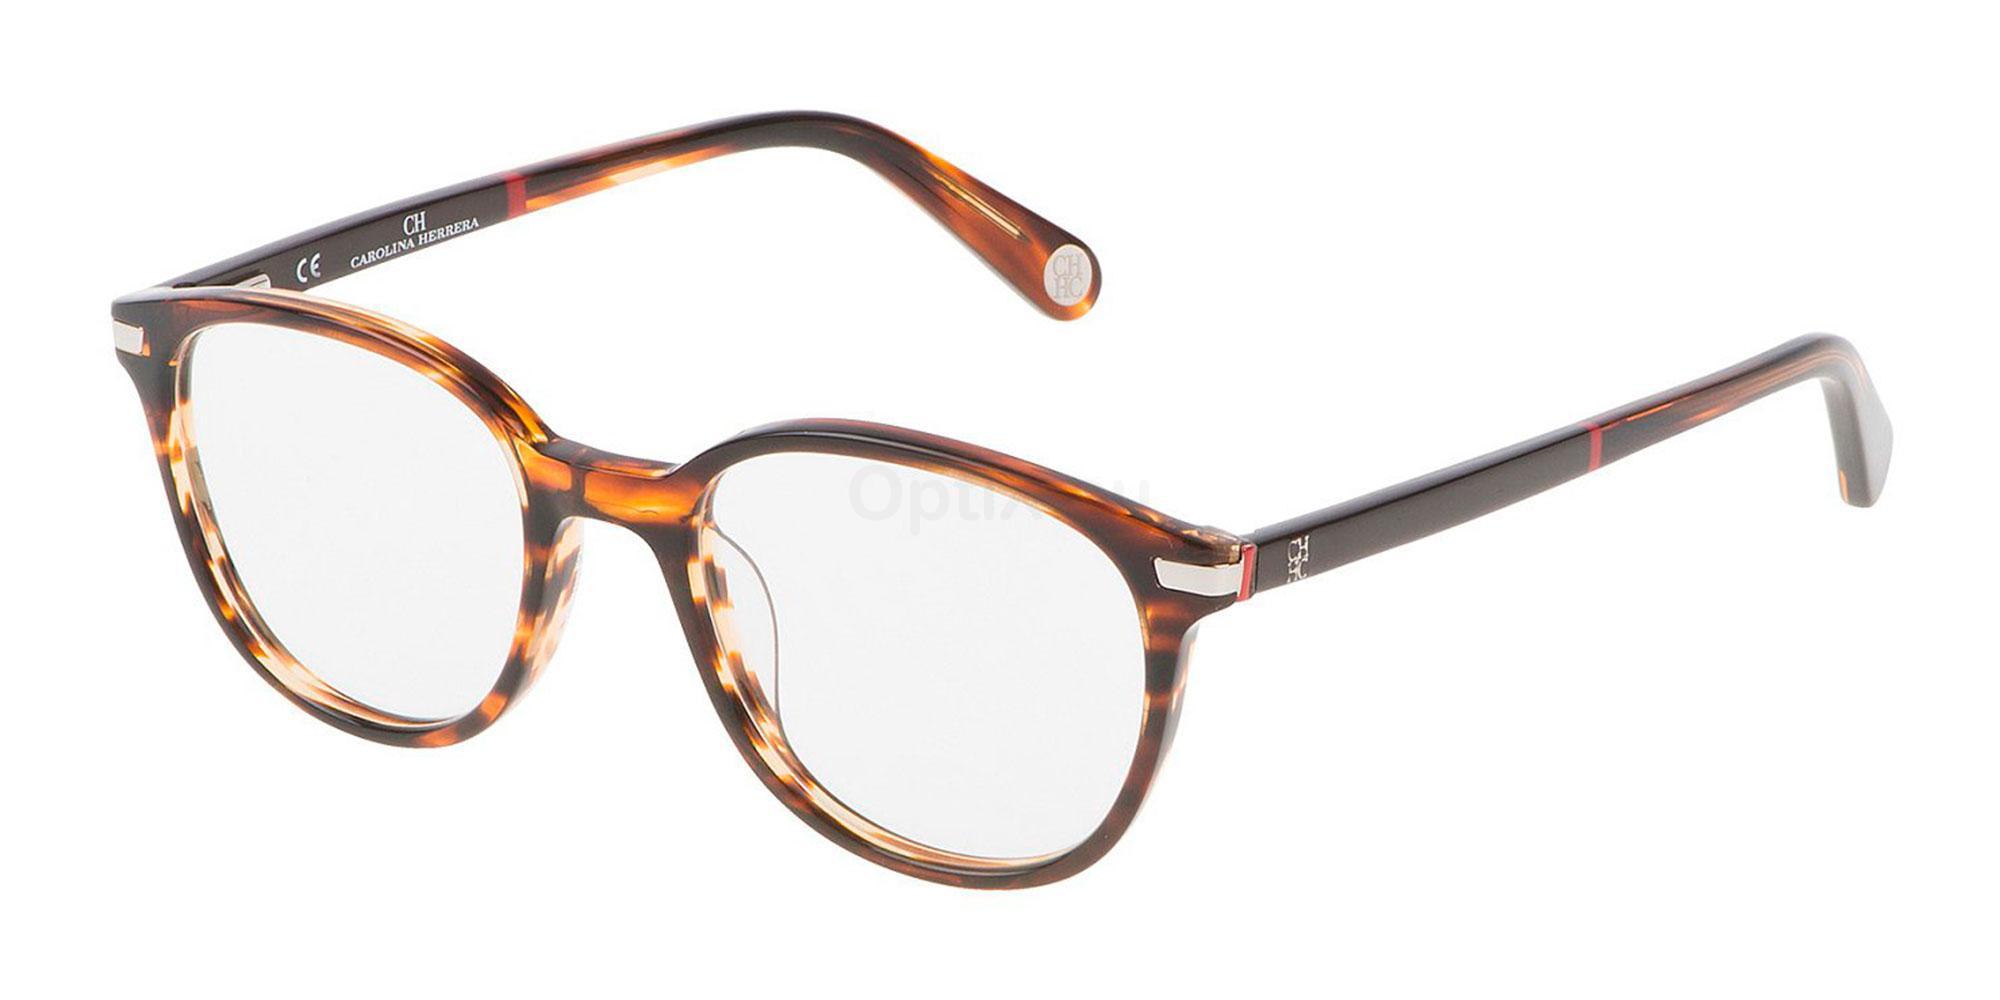 09RS VHE666 Glasses, CH Carolina Herrera